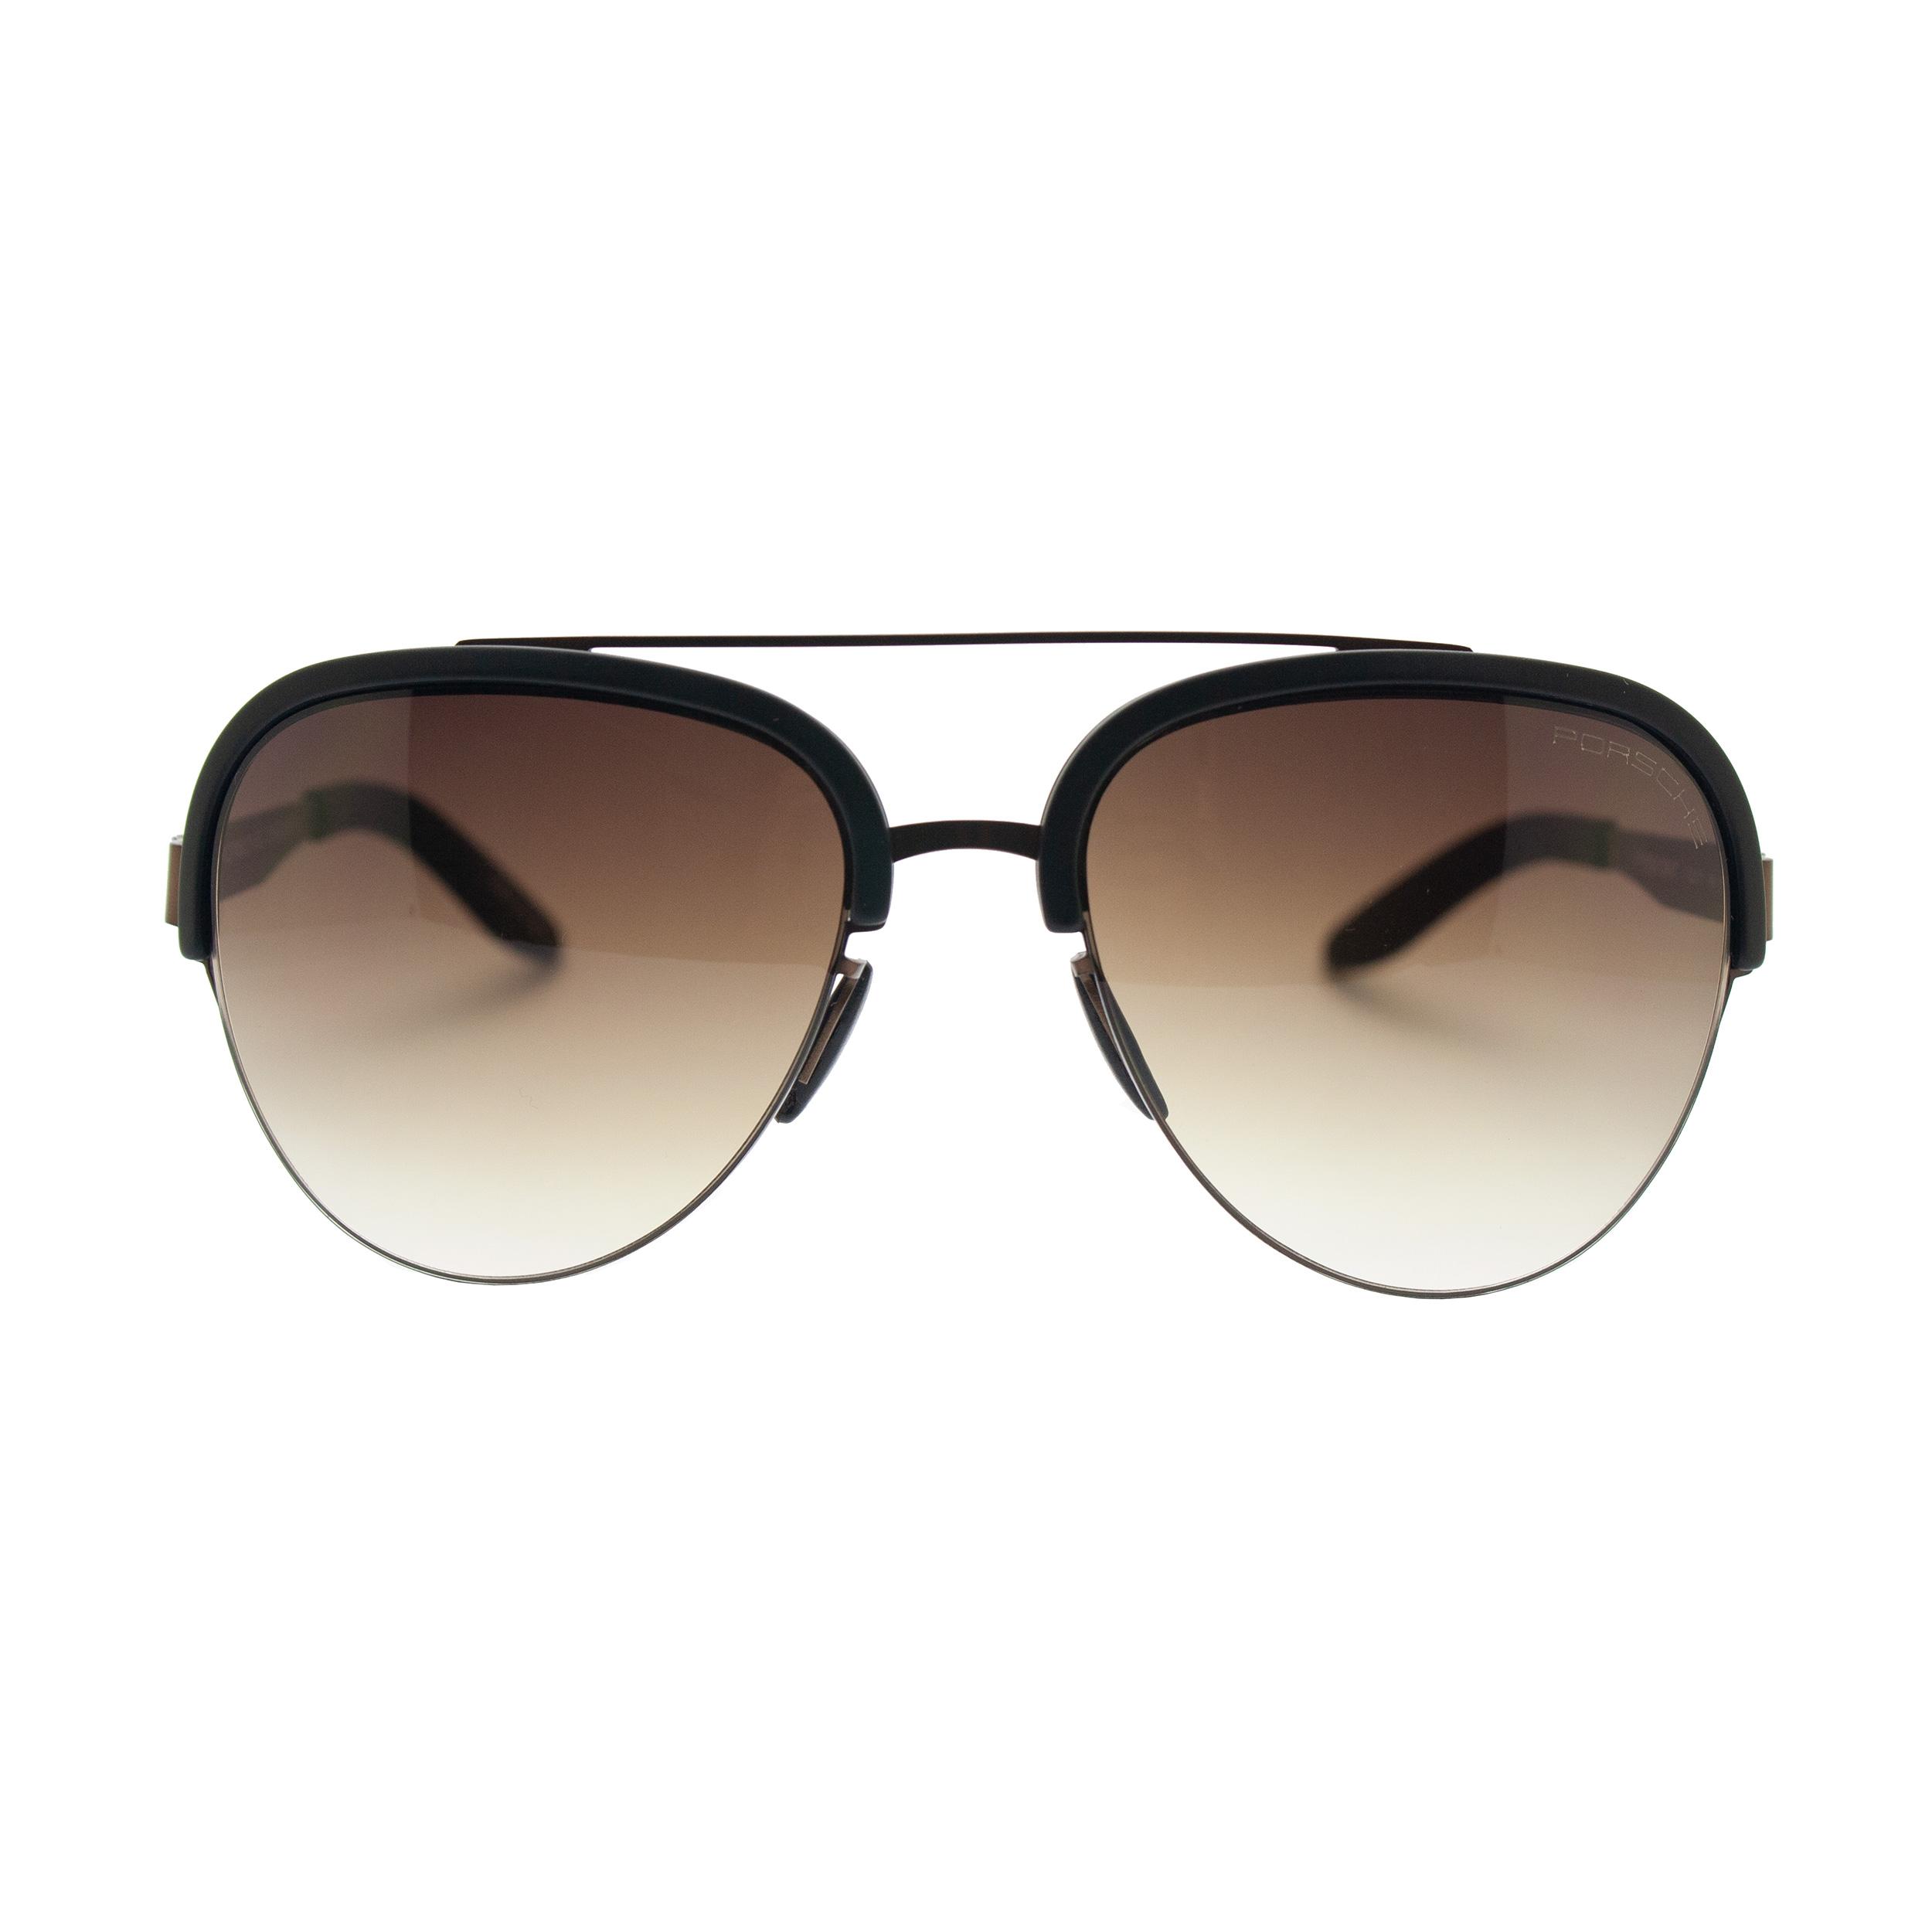 عینک آفتابی پورش دیزاین مدل P8938 SNT BR